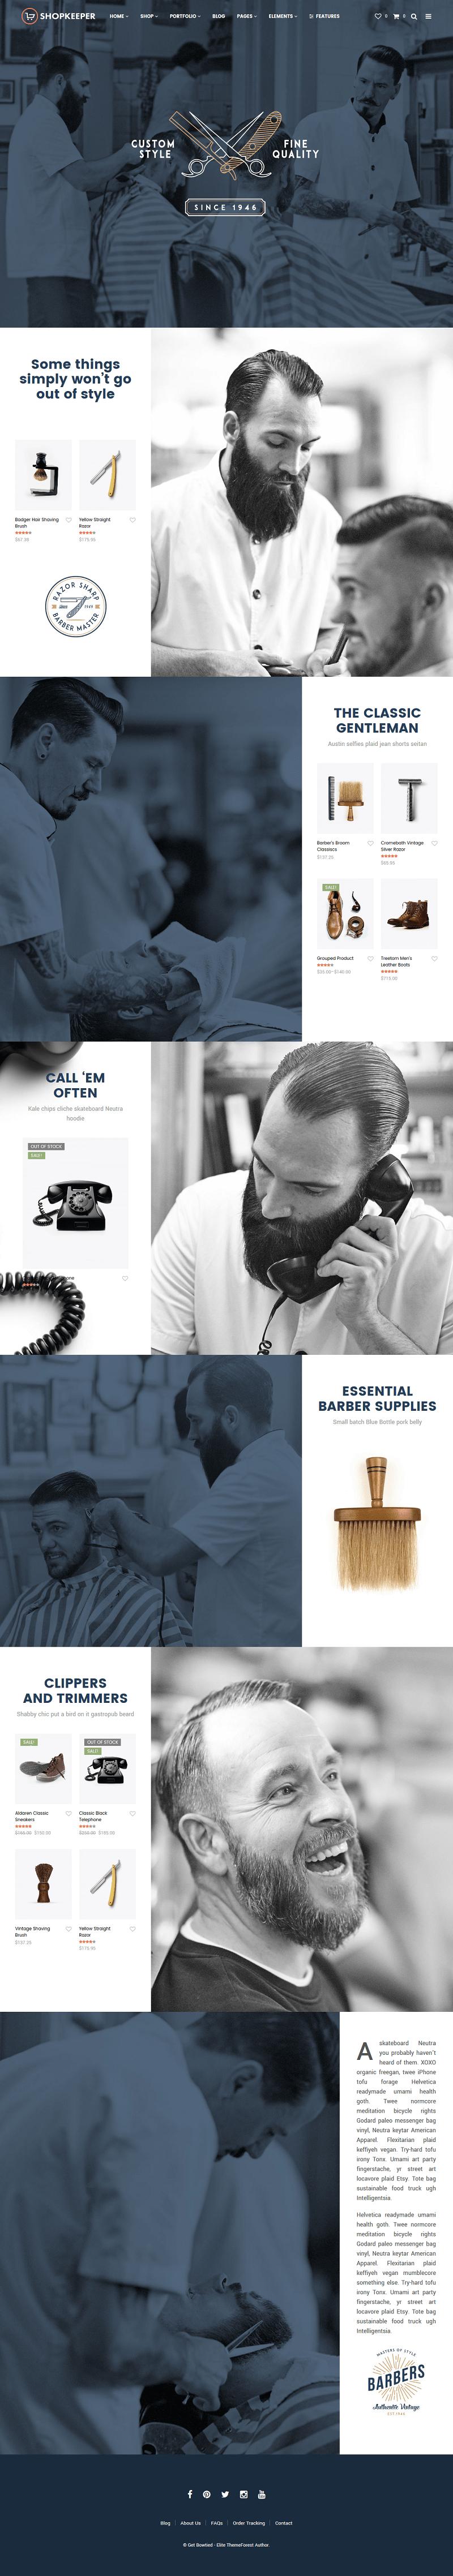 shopkepper for web design inspiration